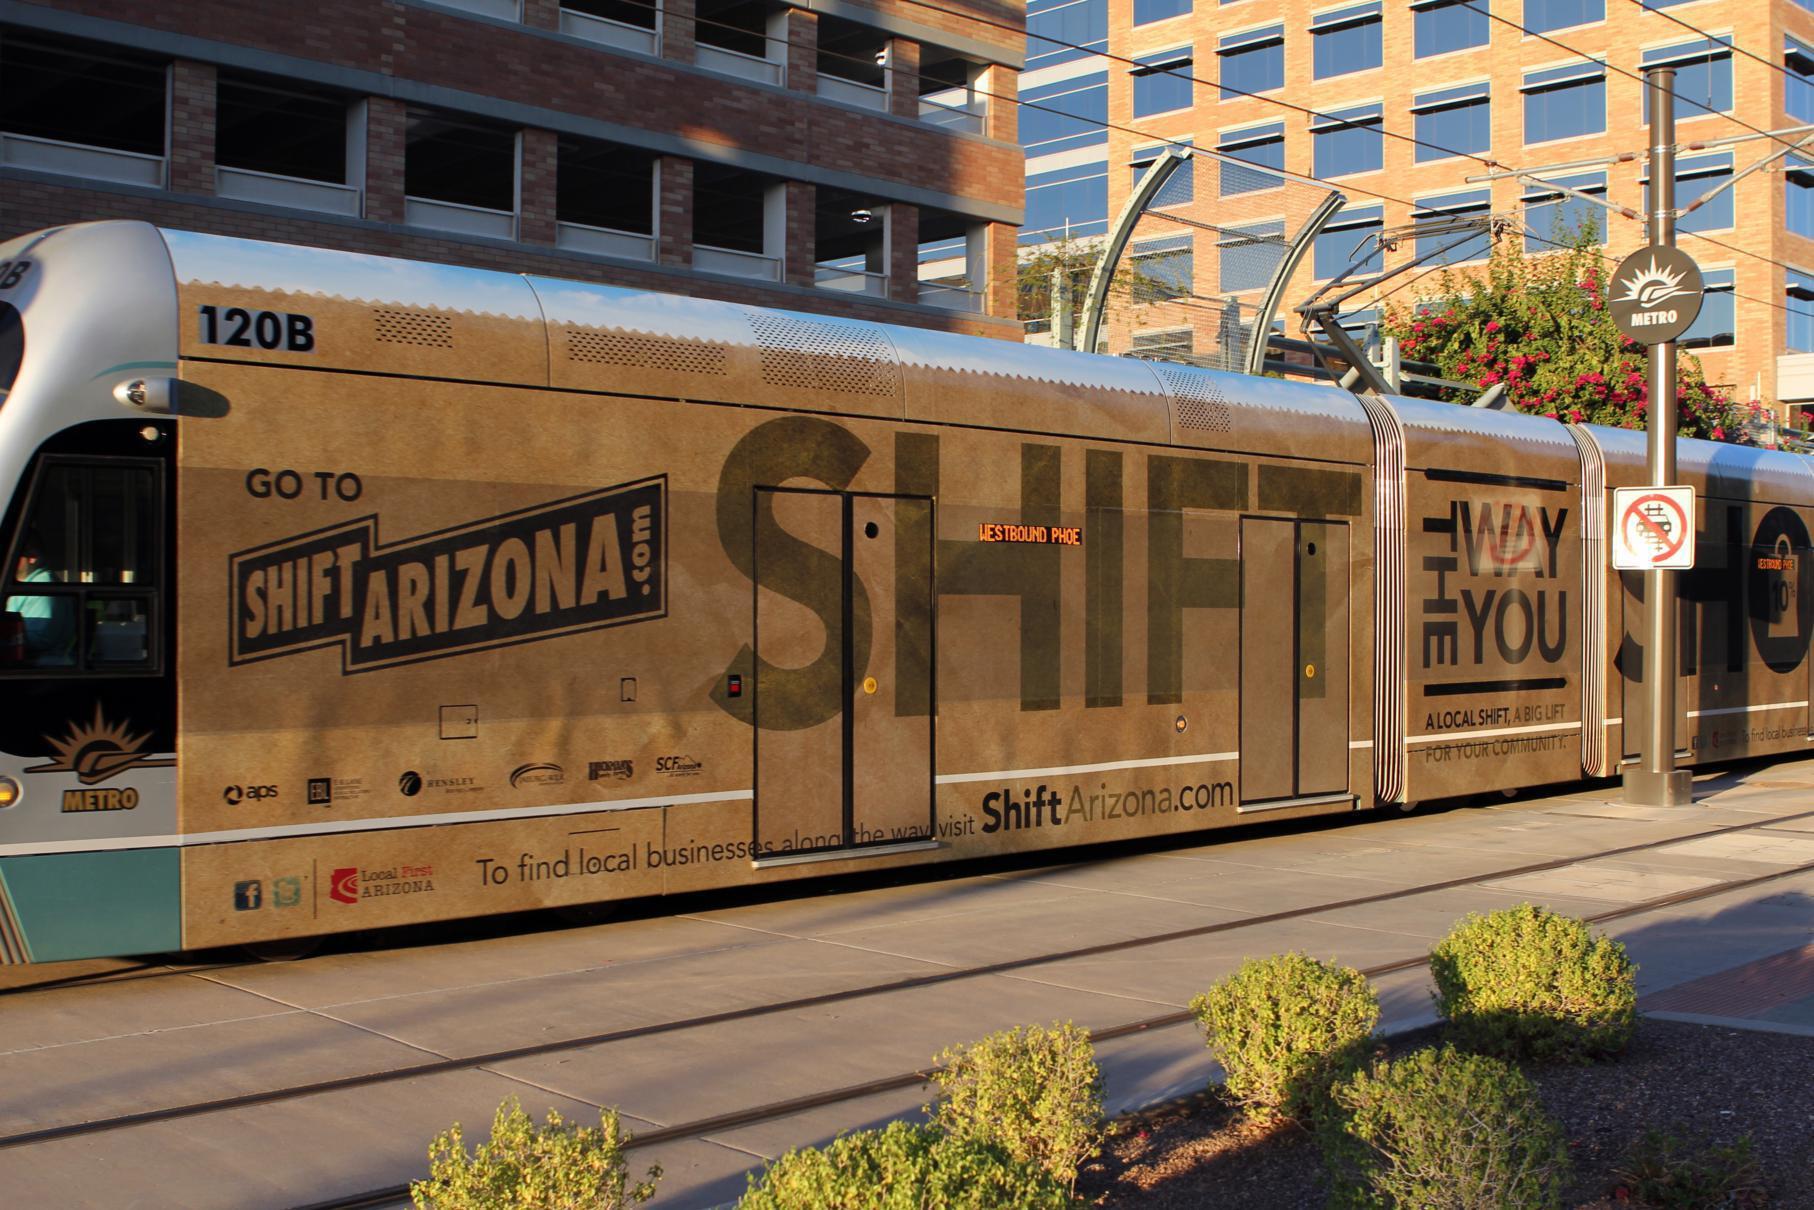 2010: Local First Arizona launches the Shift Arizona campaign.